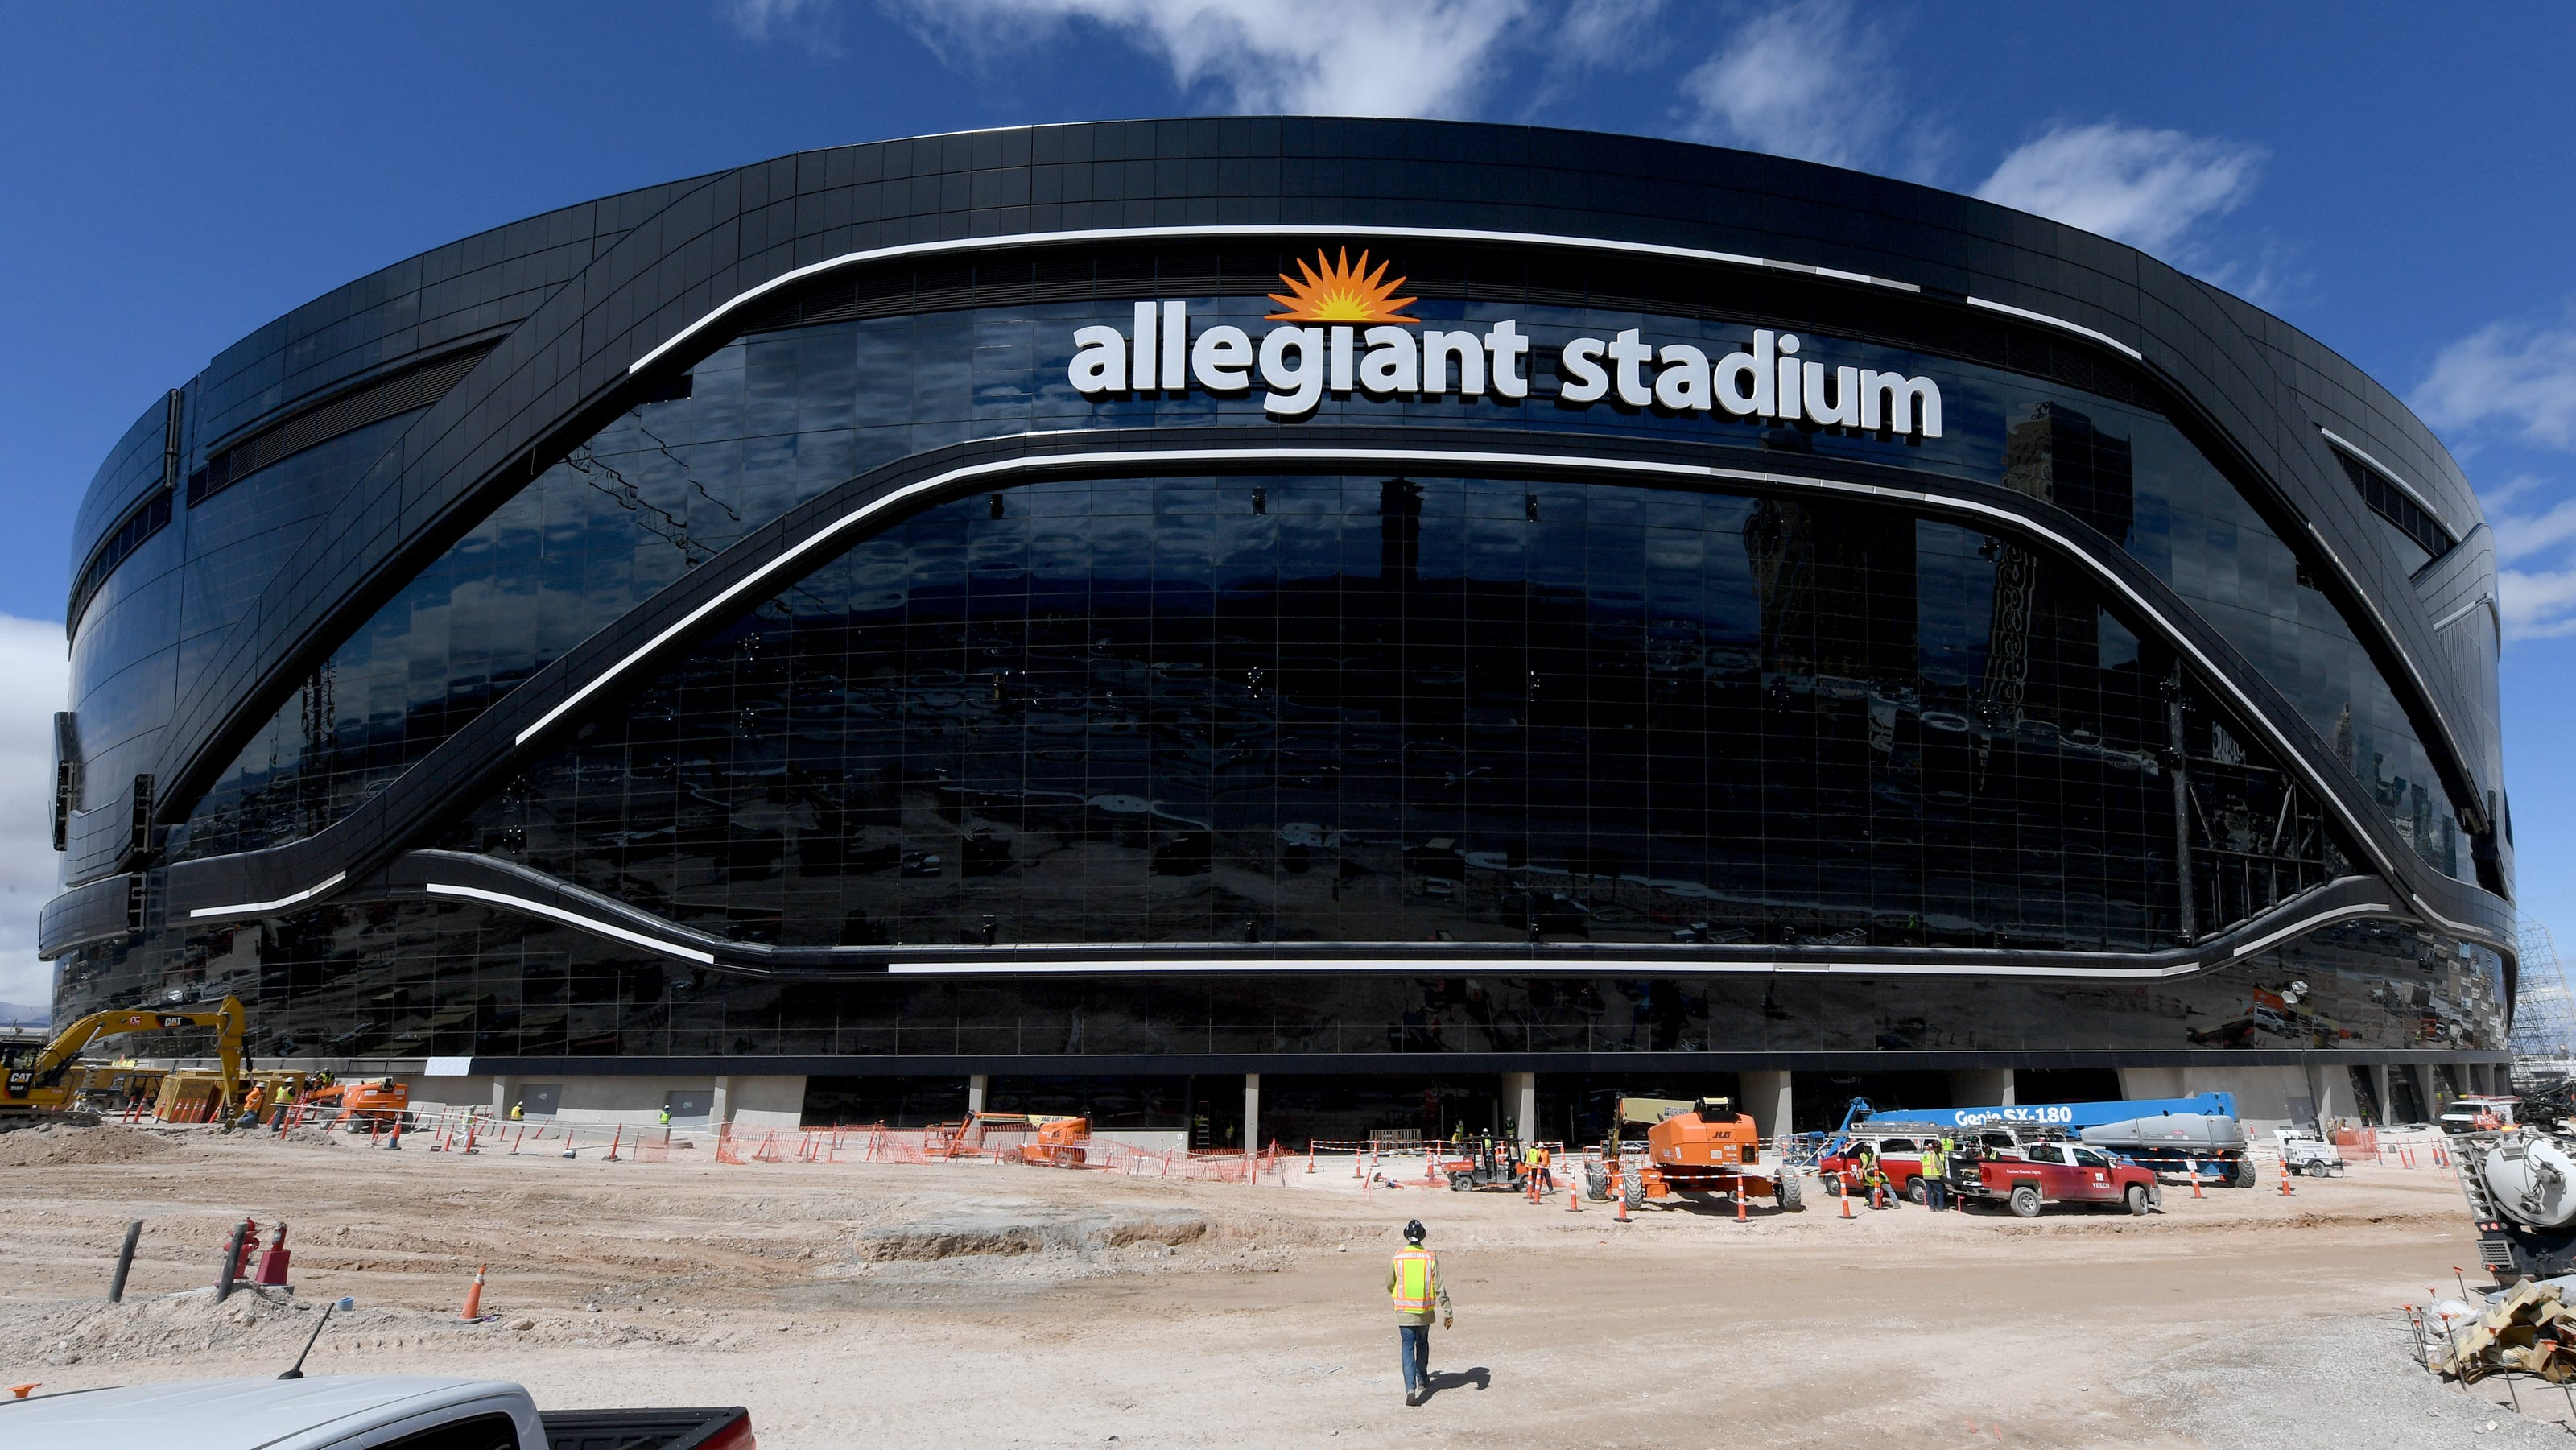 Forbes El Paso Possible Site For Las Vegas Raiders Nfl Games